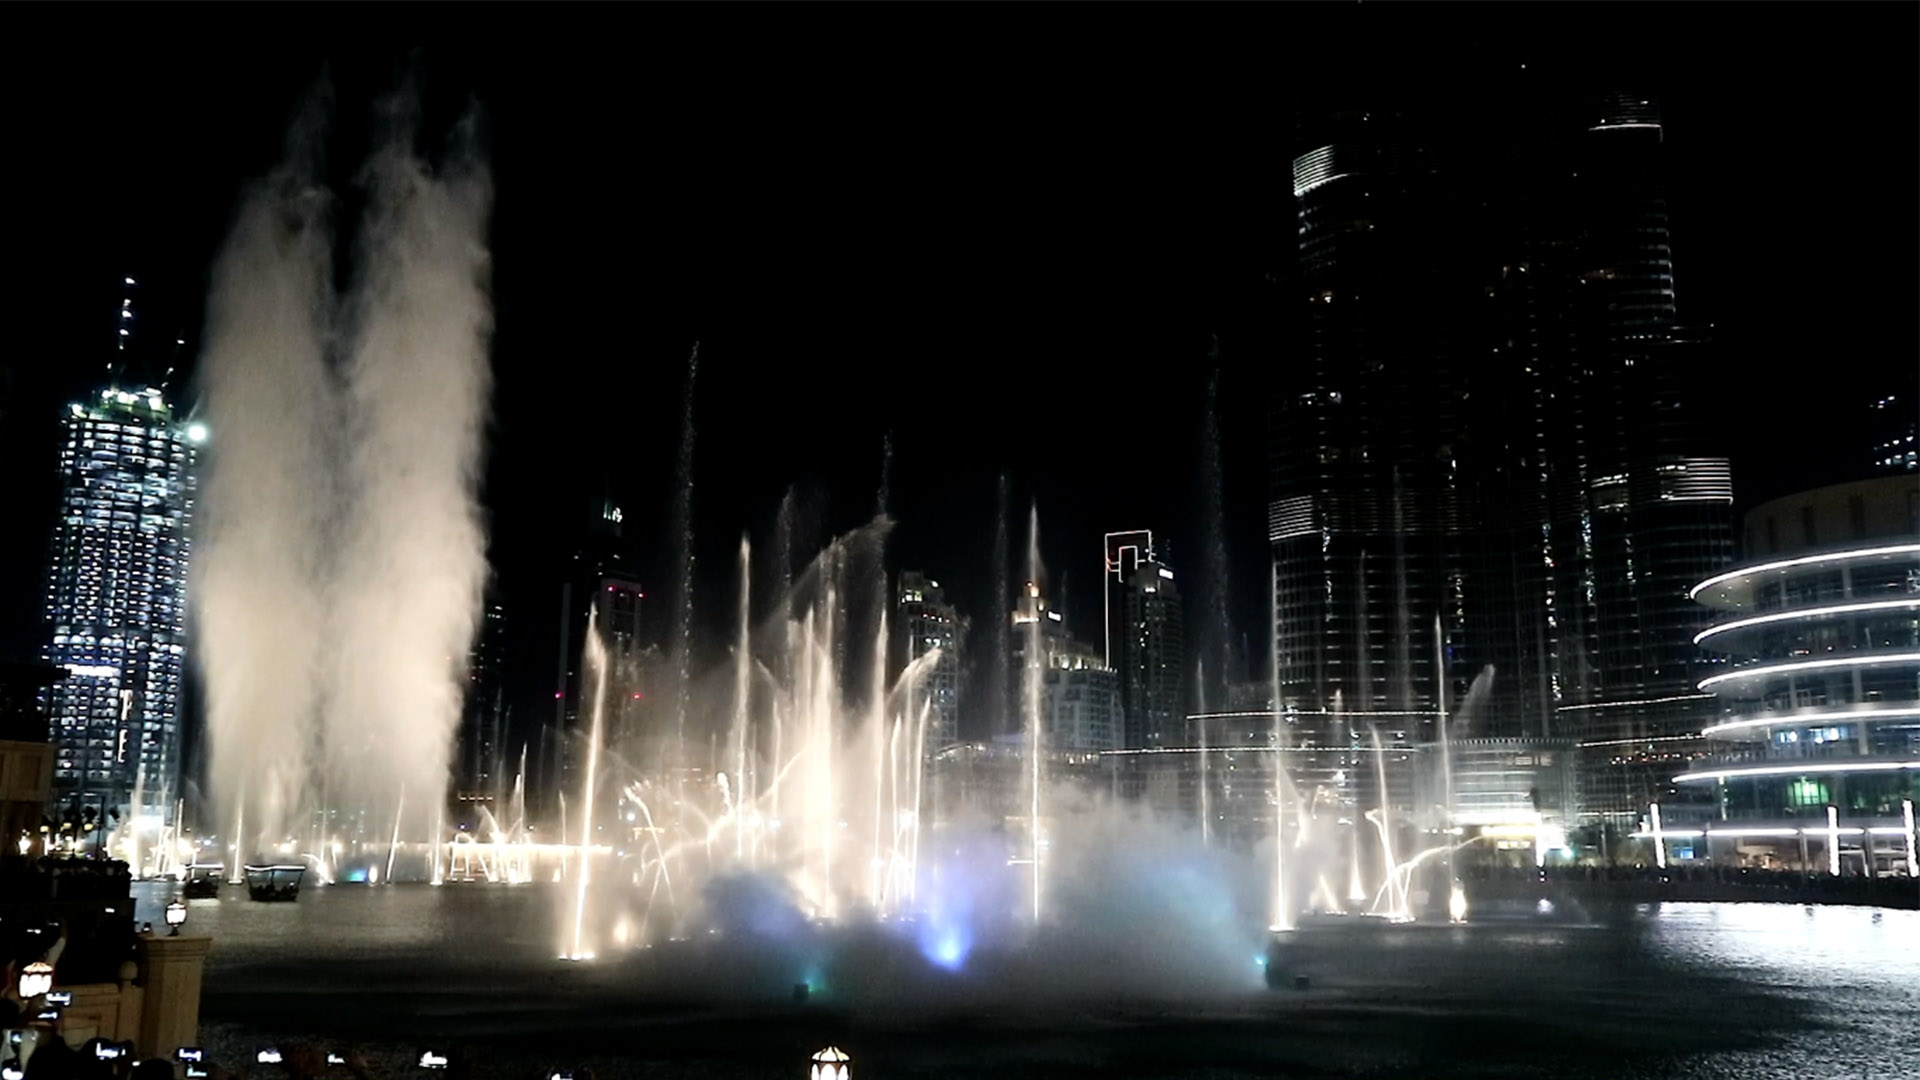 water fountain show in action in dubai downtown happening between burj khalifa and dubai mall